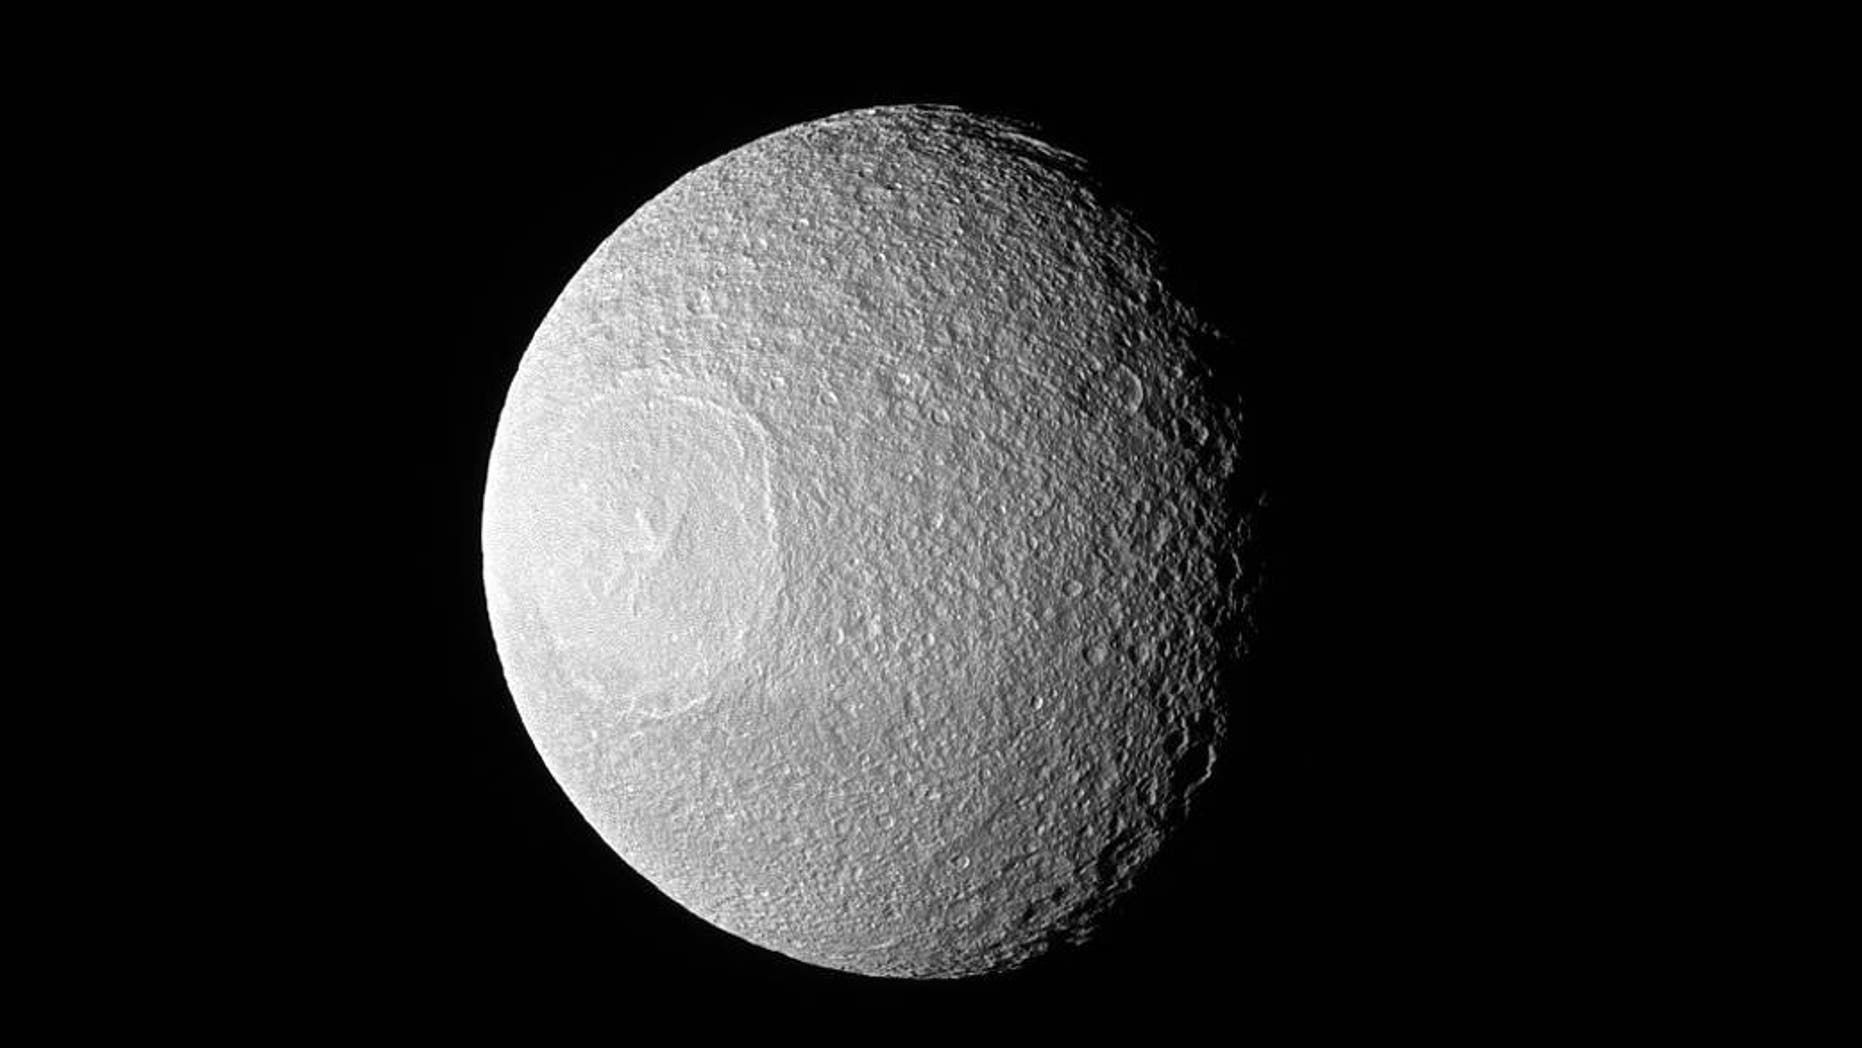 Saturn's moon Tethys (NASA/JPL-Caltech/Space Science Institute).